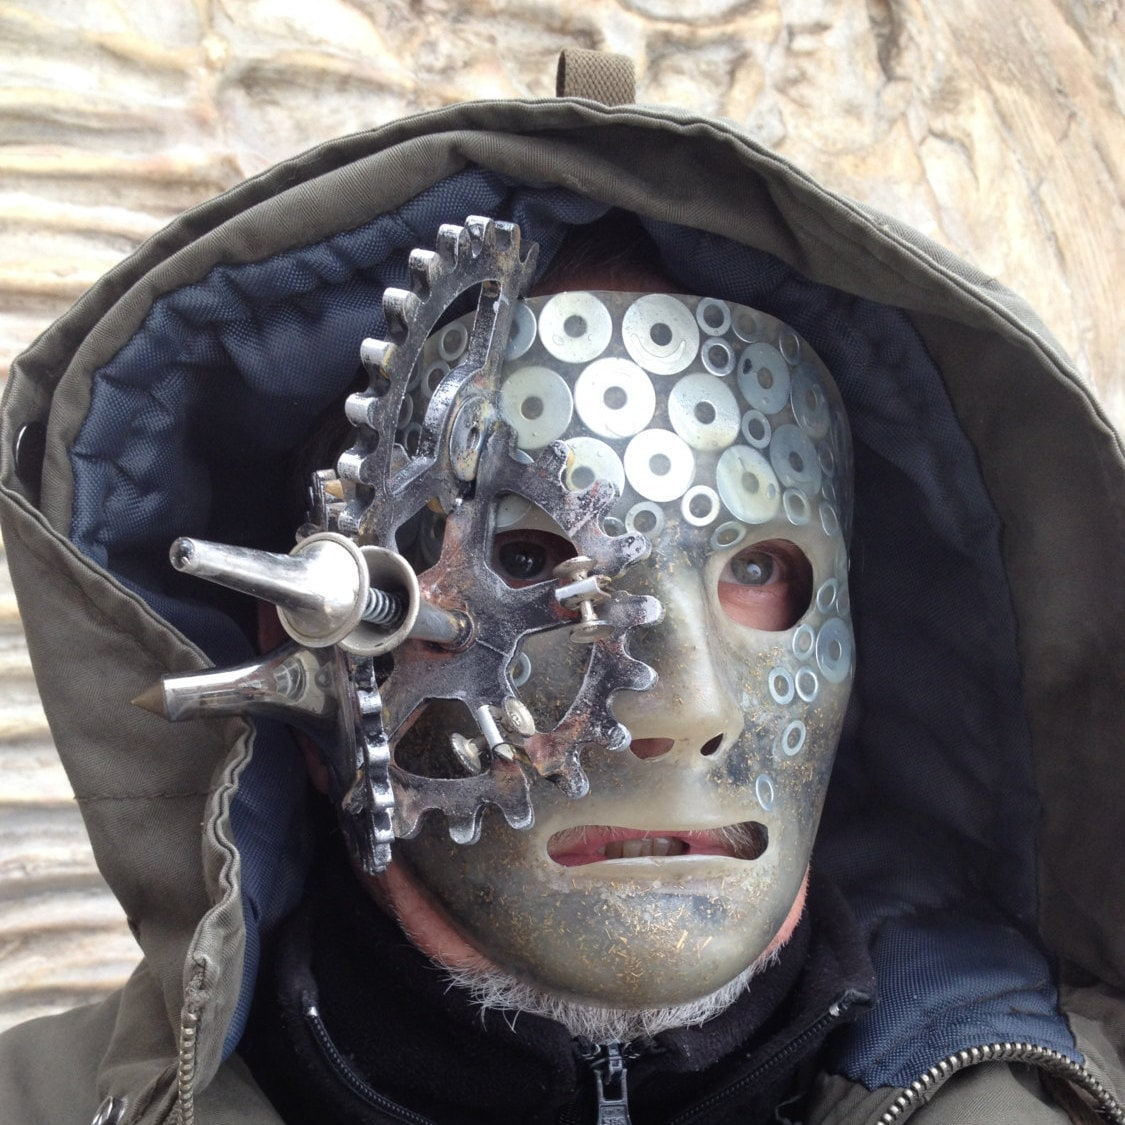 Steampunk Mask,Halloween Mask, Techno Mask, Masquerade Mask, Accessories,  Futuristic, Cybergoth Mask, ace Mask,Parti Mask, Masks for Men